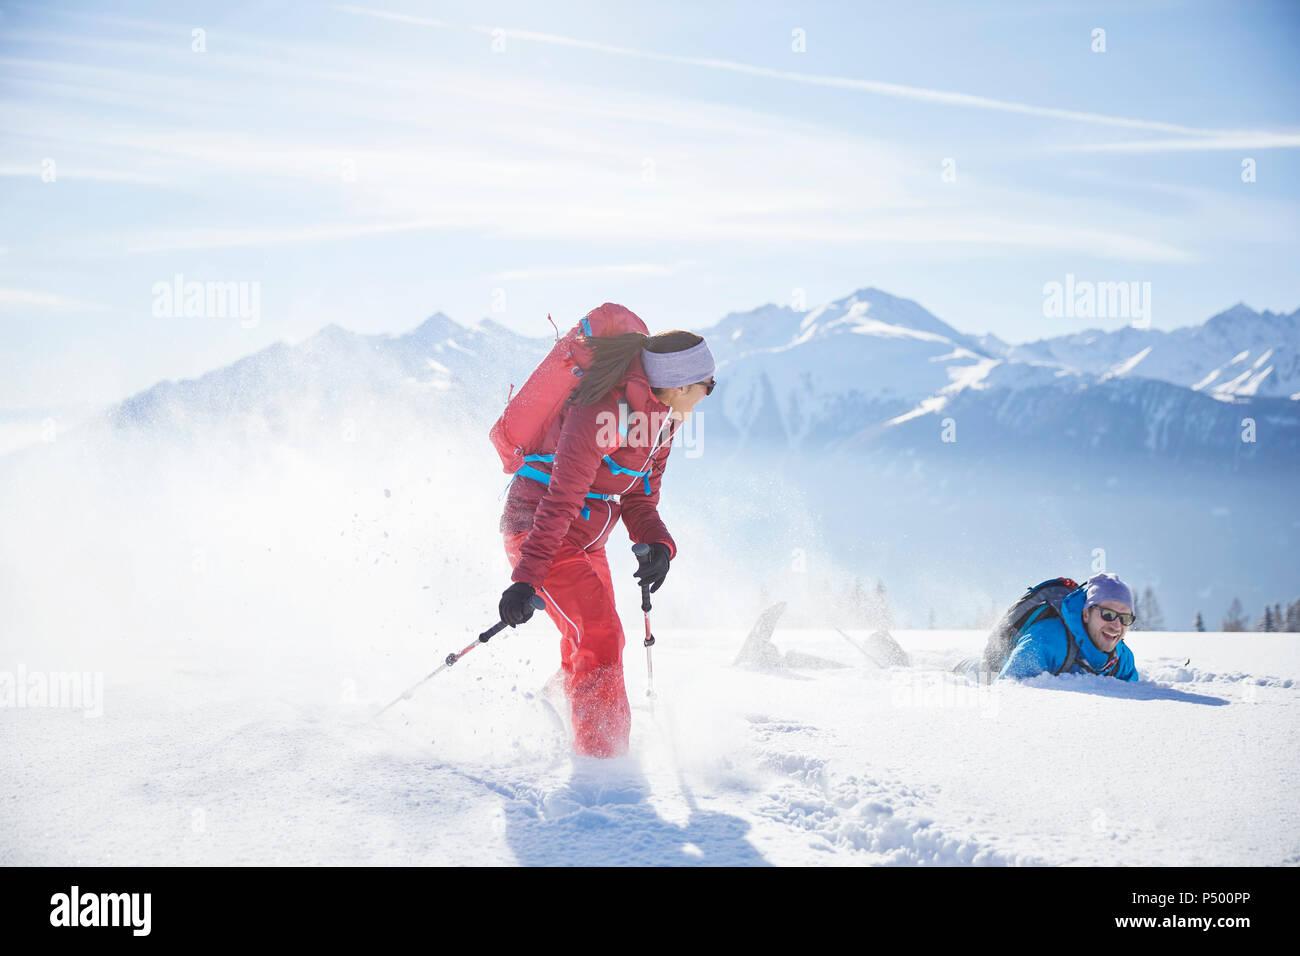 Austria, Tyrol, snowshoe hikers running through snow, man falling - Stock Image